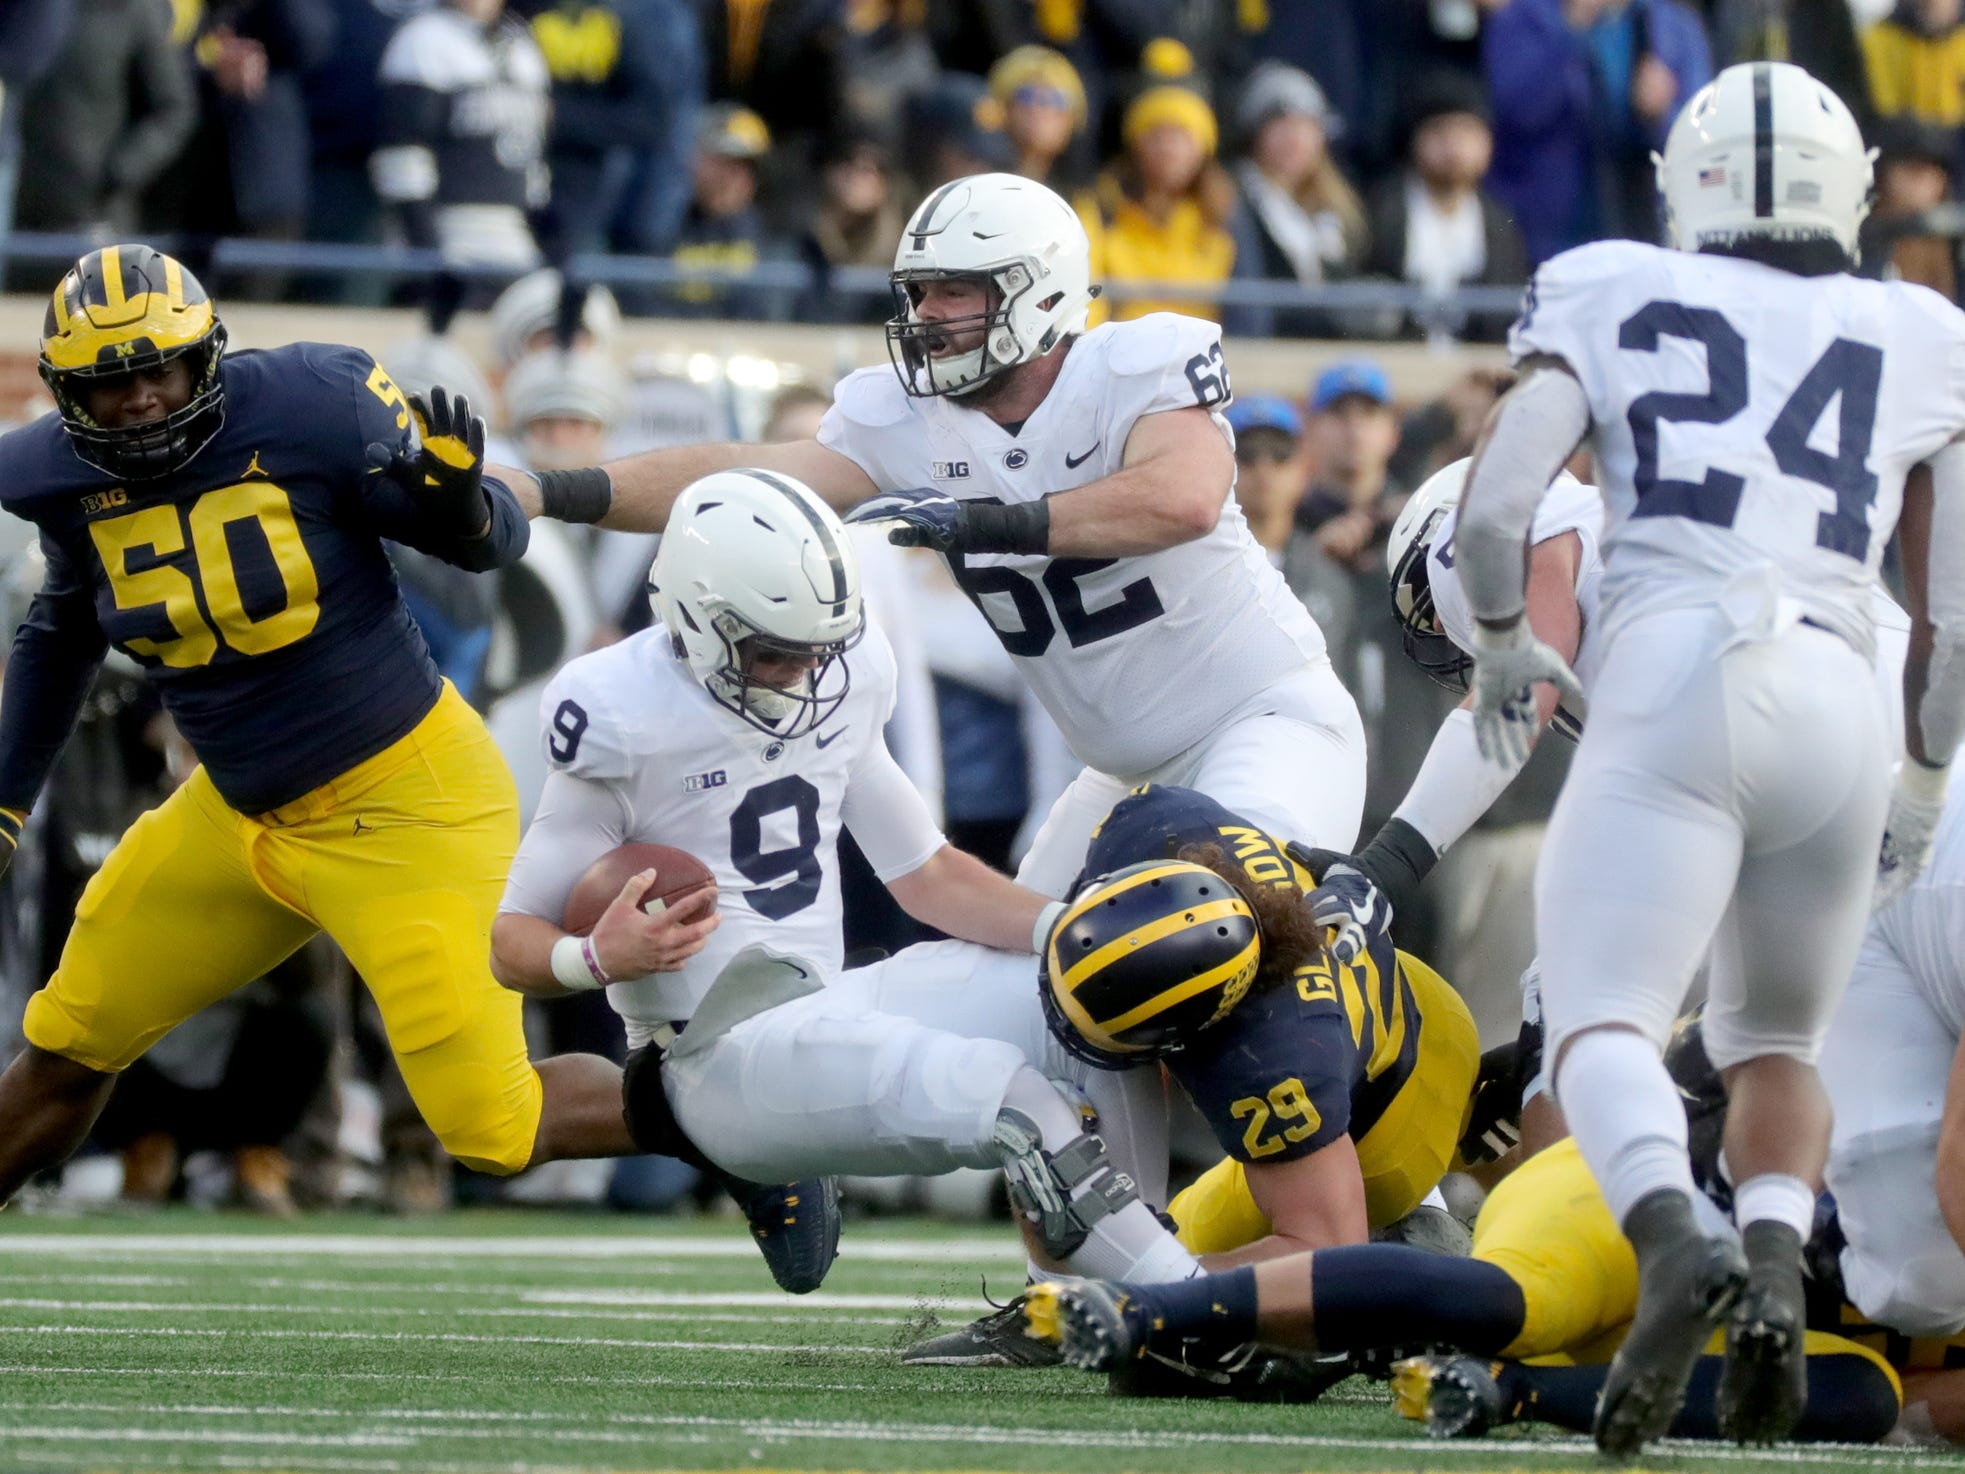 Michigan's Jordan Glasgow hits Penn State quarterback Trace McSorley during the first half Saturday, November 3, 2018 at Michigan Stadium in Ann Arbor.